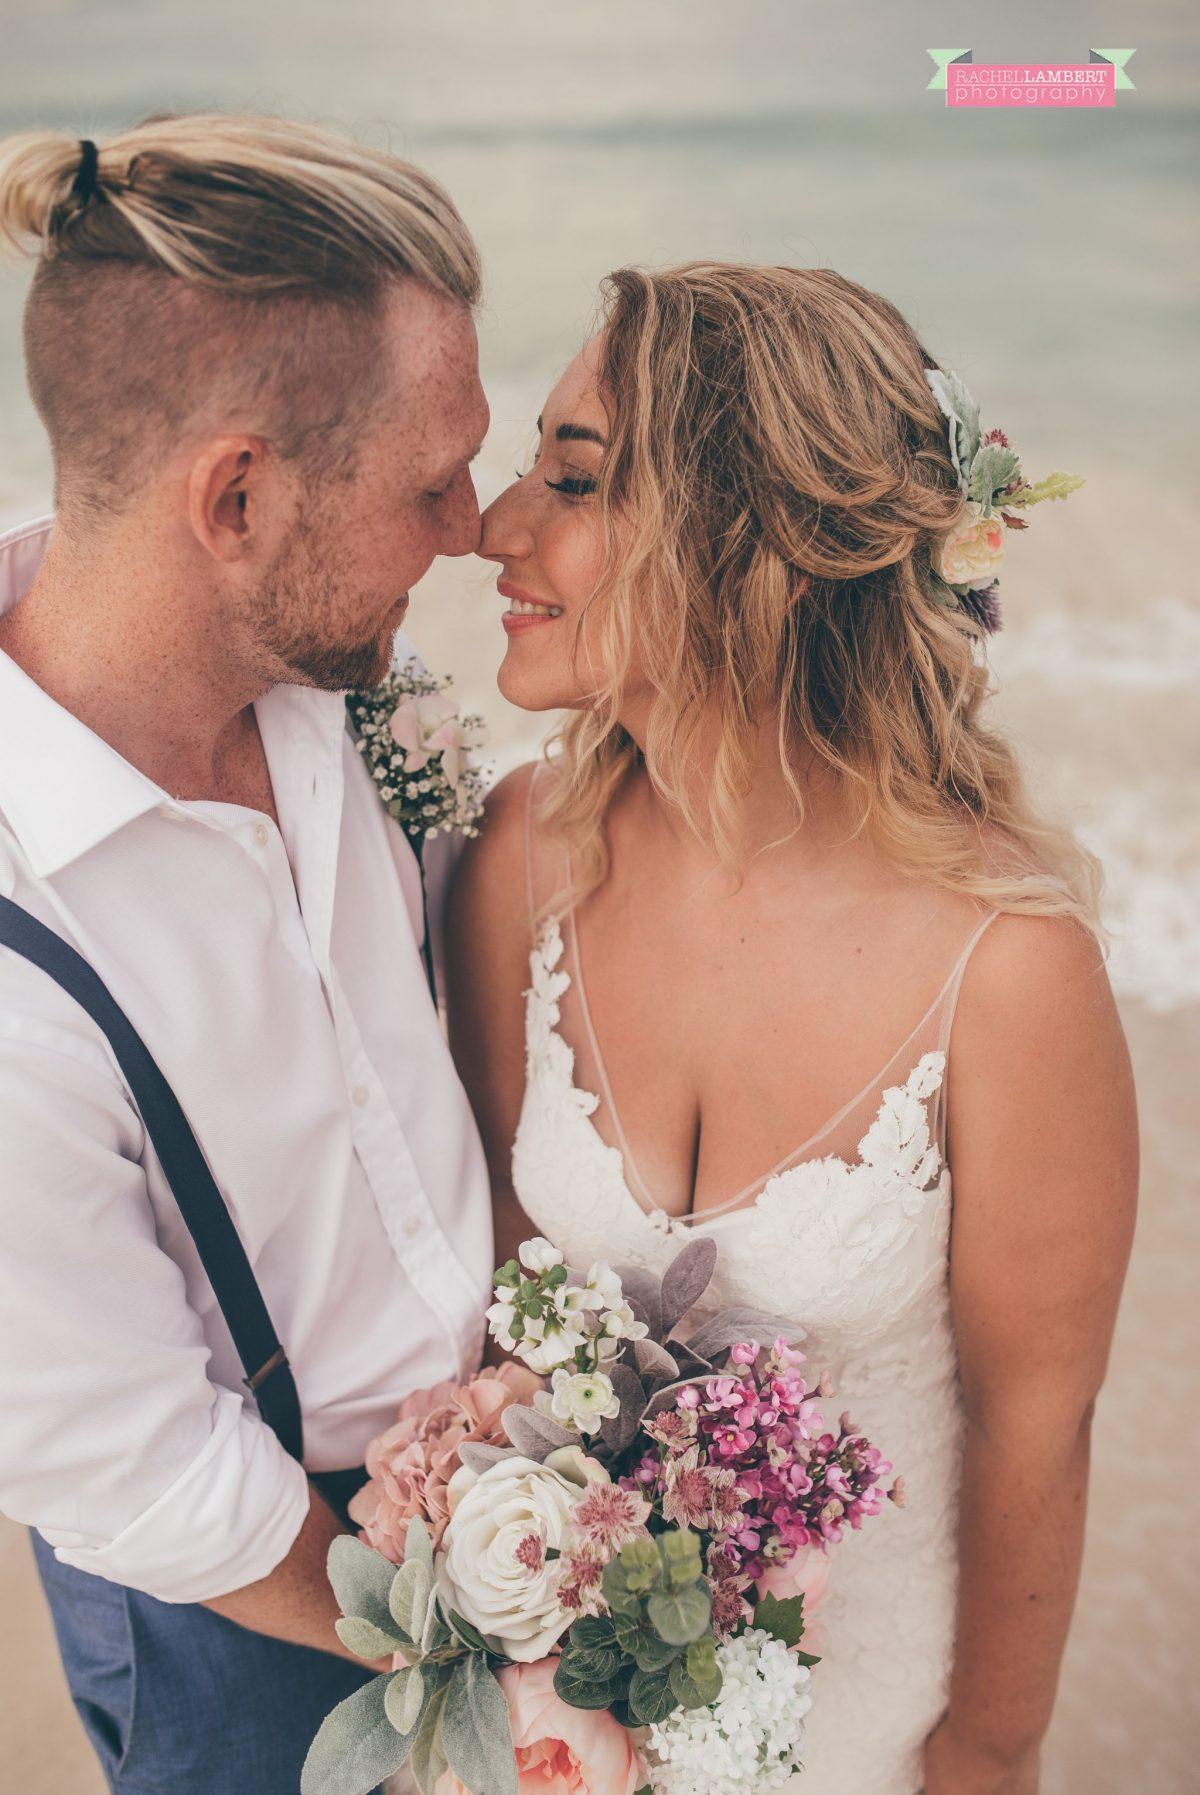 lauren and sams epic beach wedding in montego bay jamaica